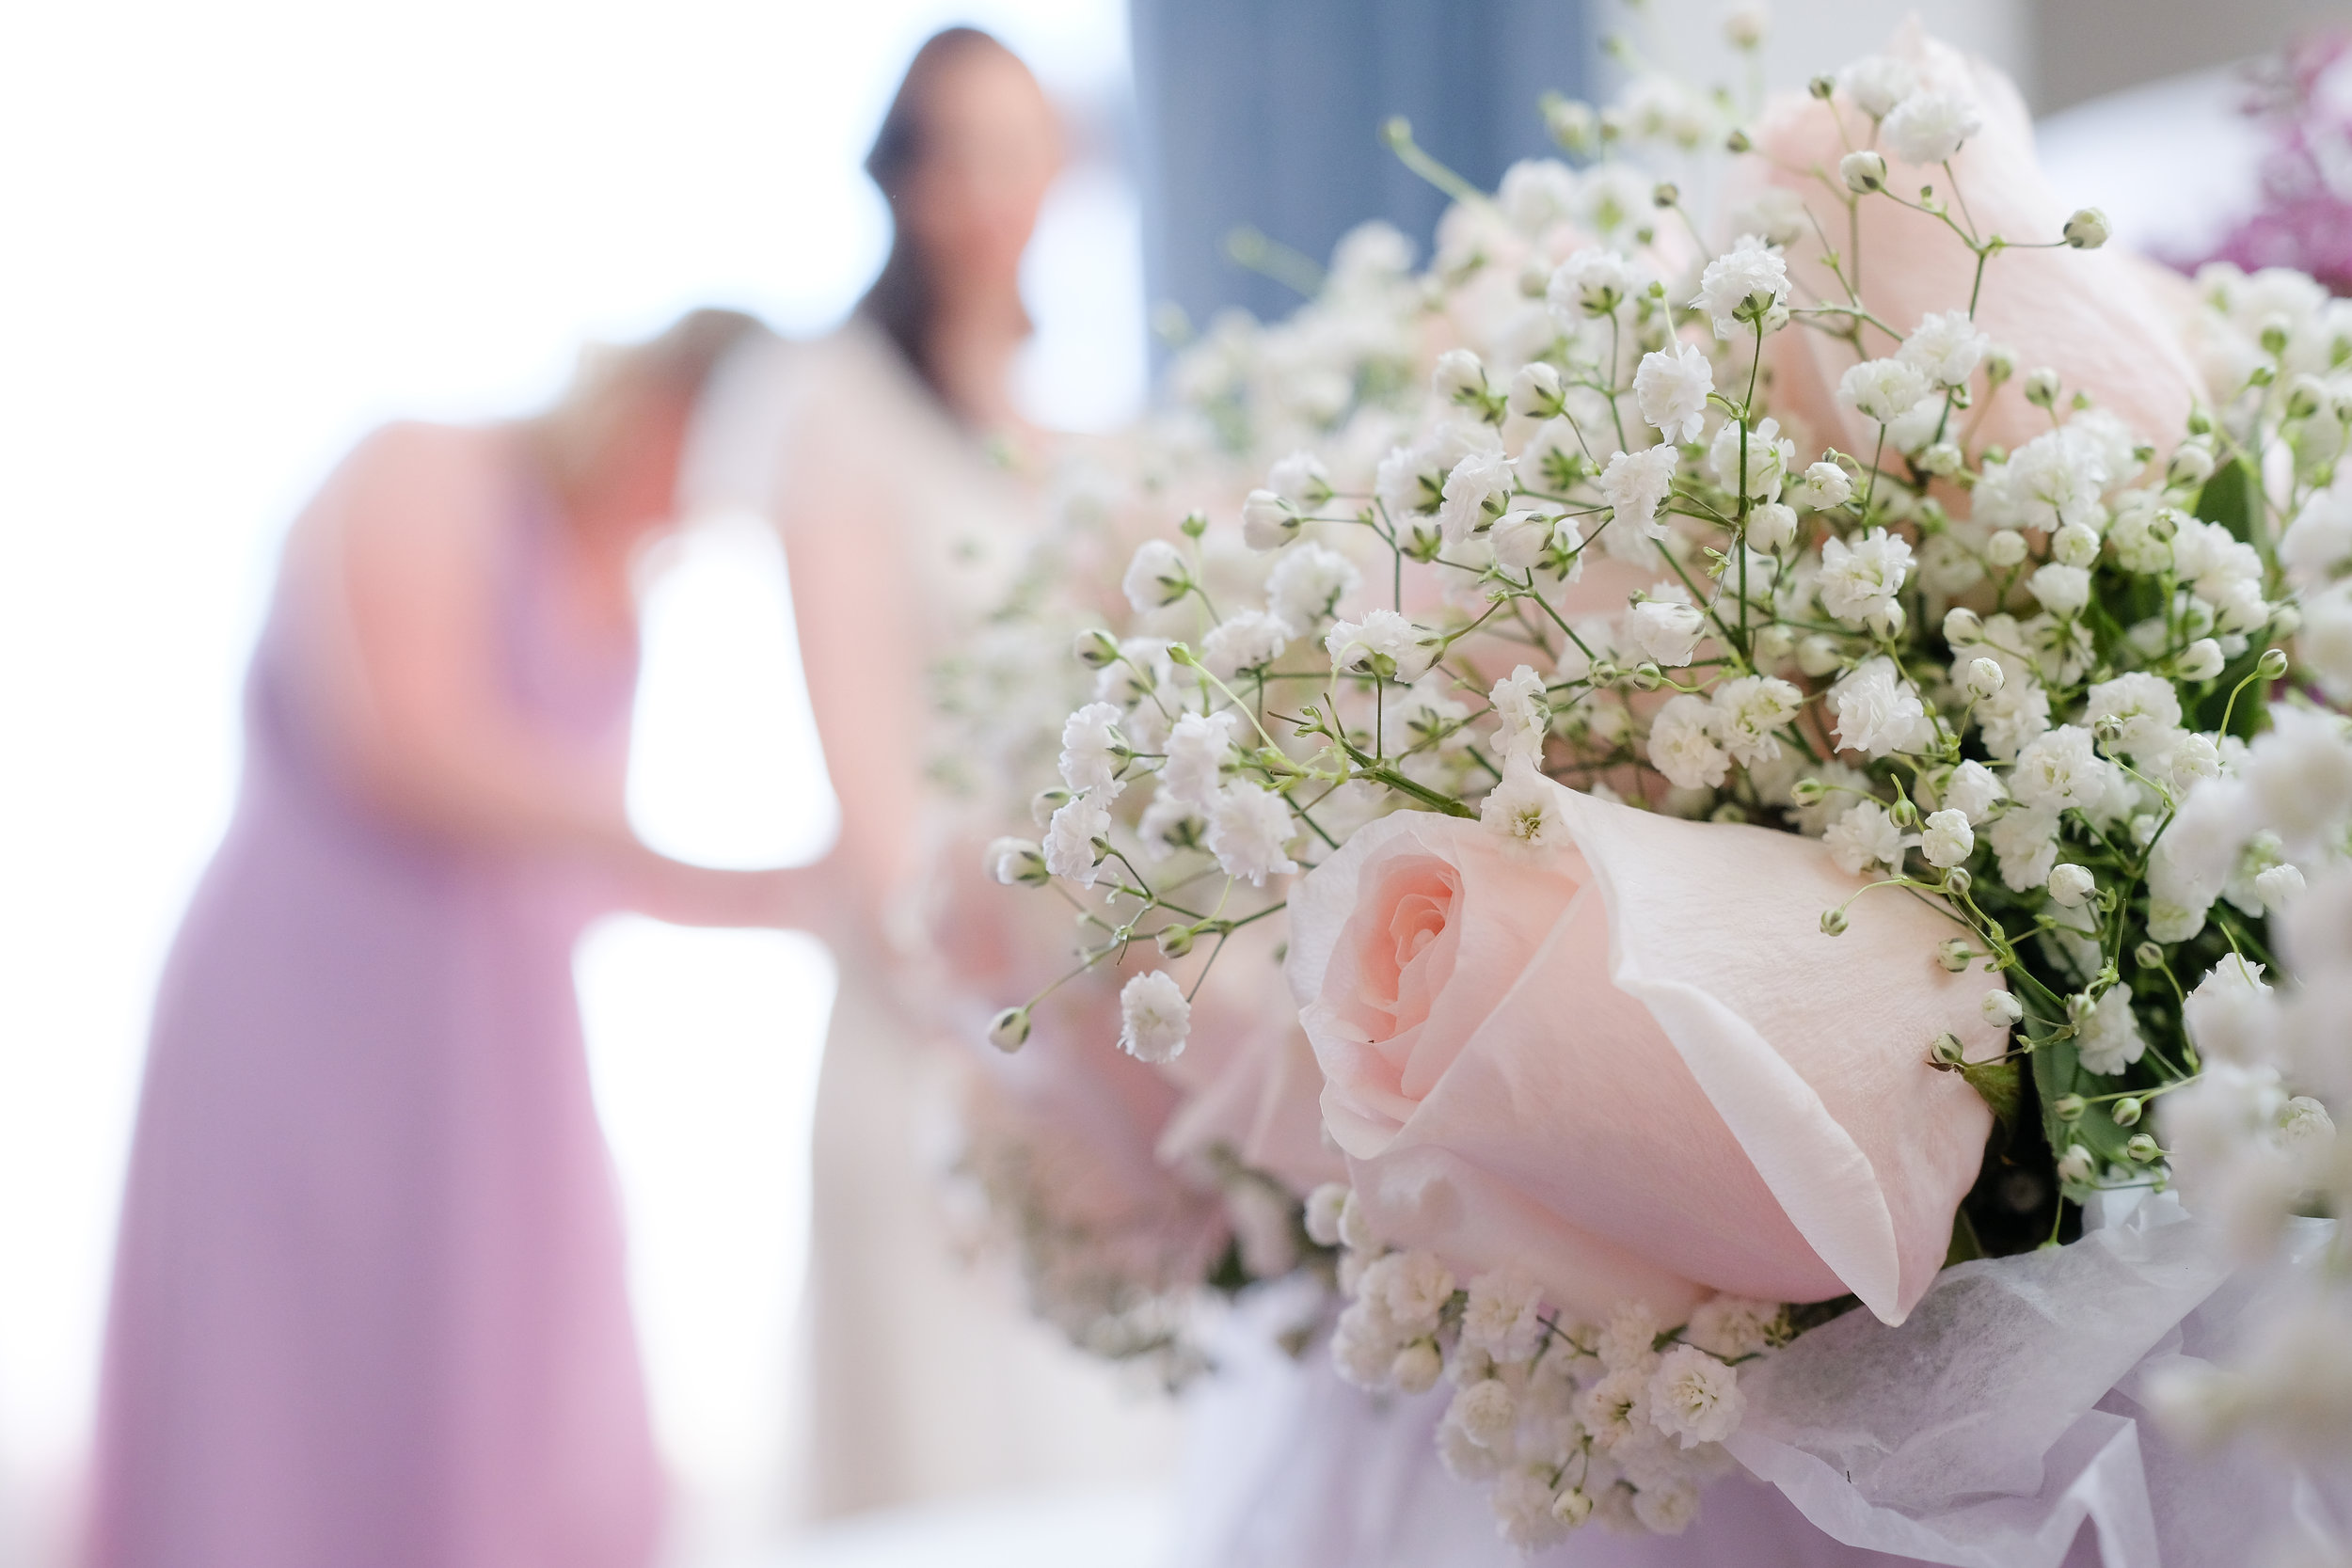 lyman-estate-wedding-photography-9.jpg